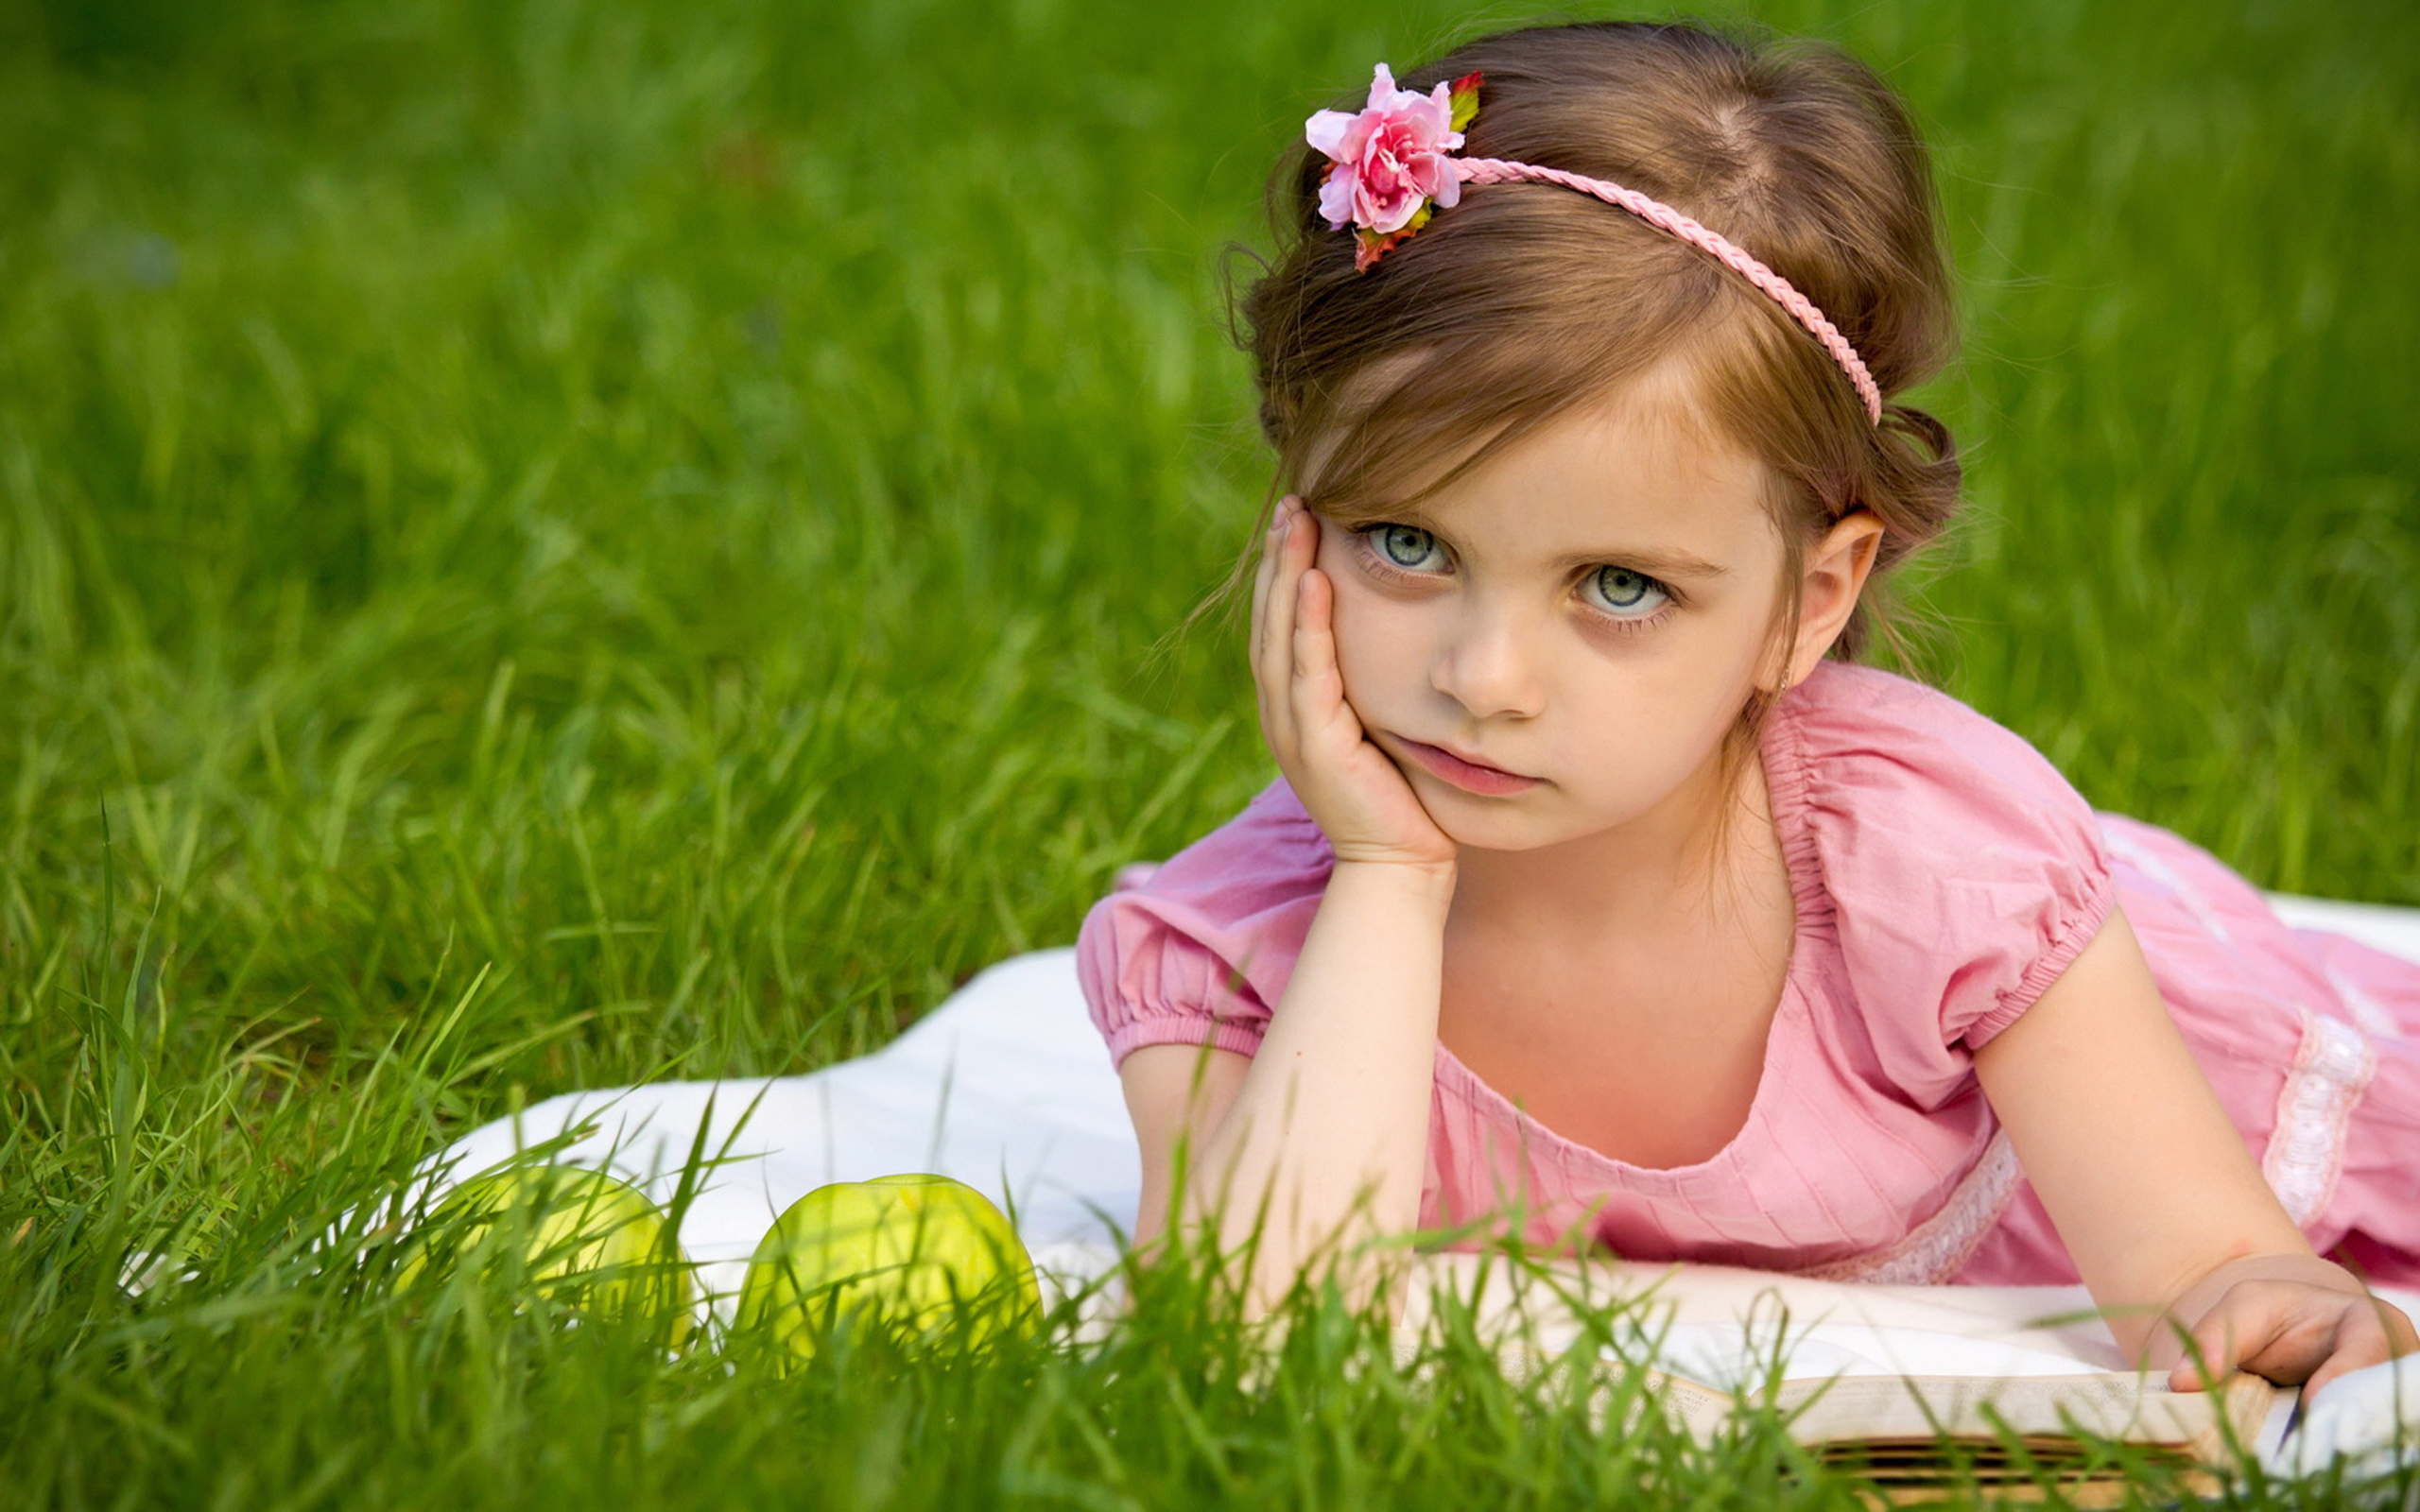 Cute Little Girl HD wallpapers   Cute Little Girl 2560x1600